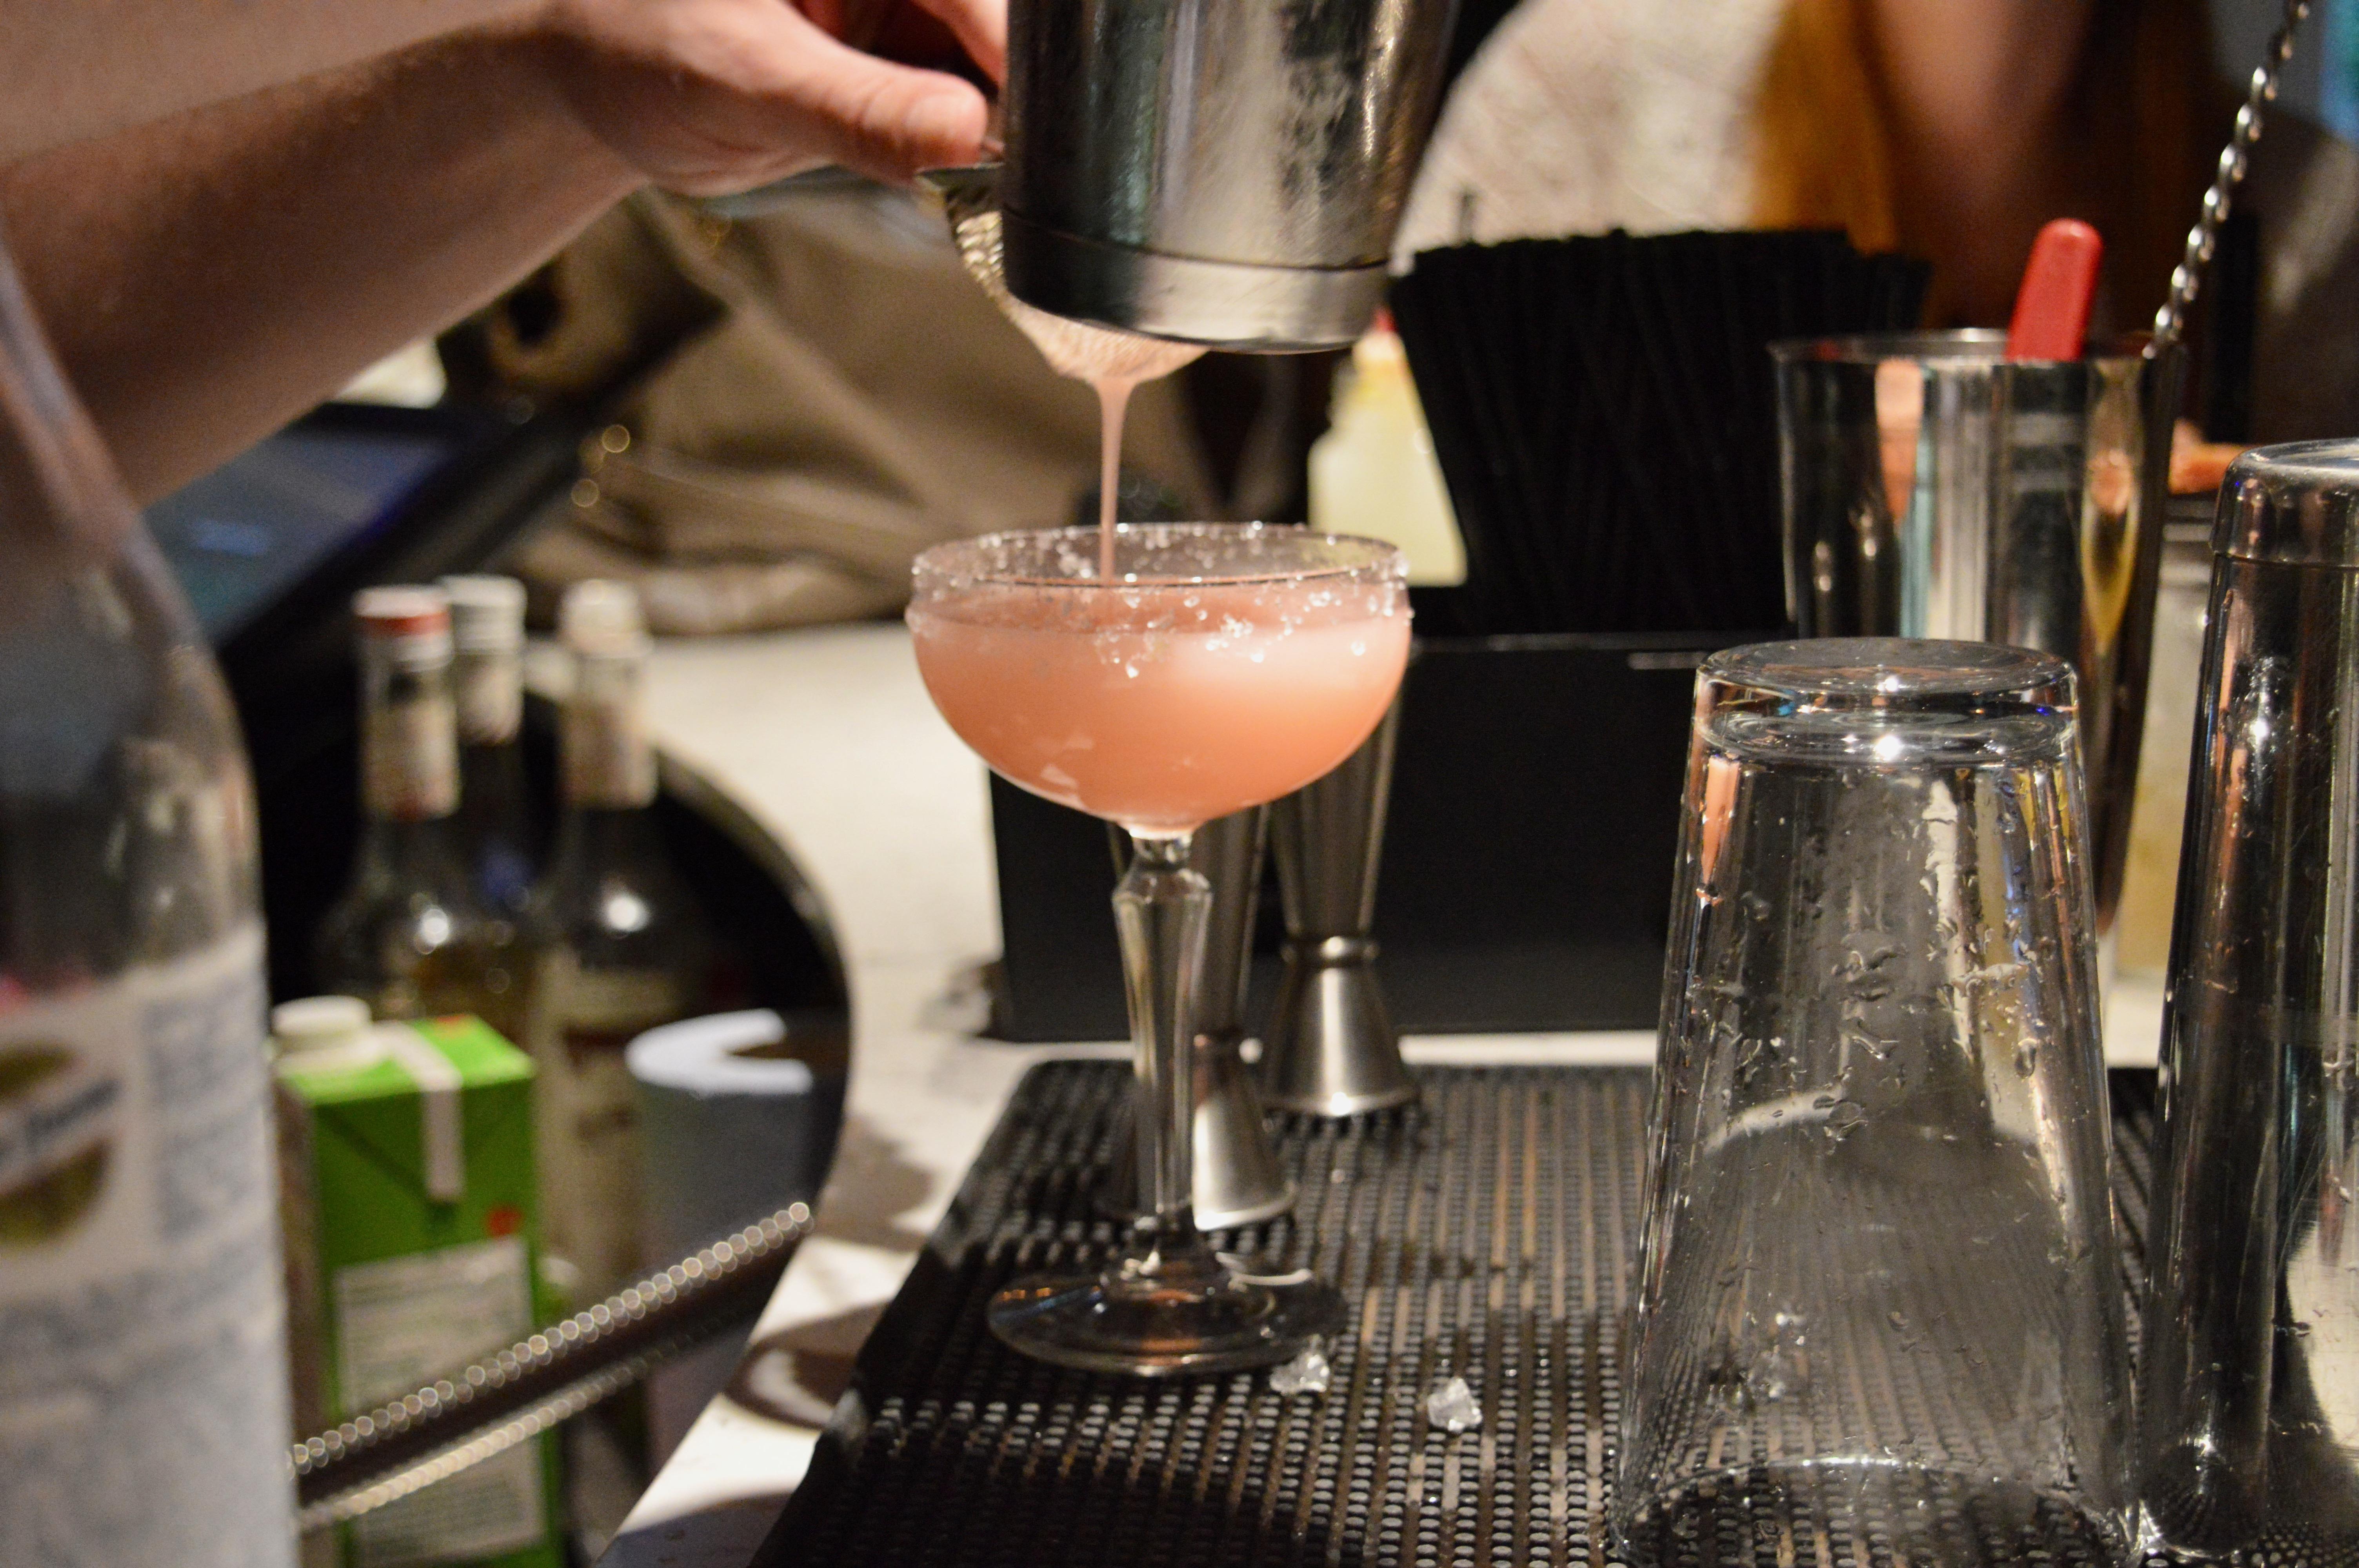 Watermelon-Martini-SoHe-Cocktail-Bar-Asian-Restaurant-Jesmond-Newcastle-Elle-Blonde-Luxury-Lifestyle-Blog